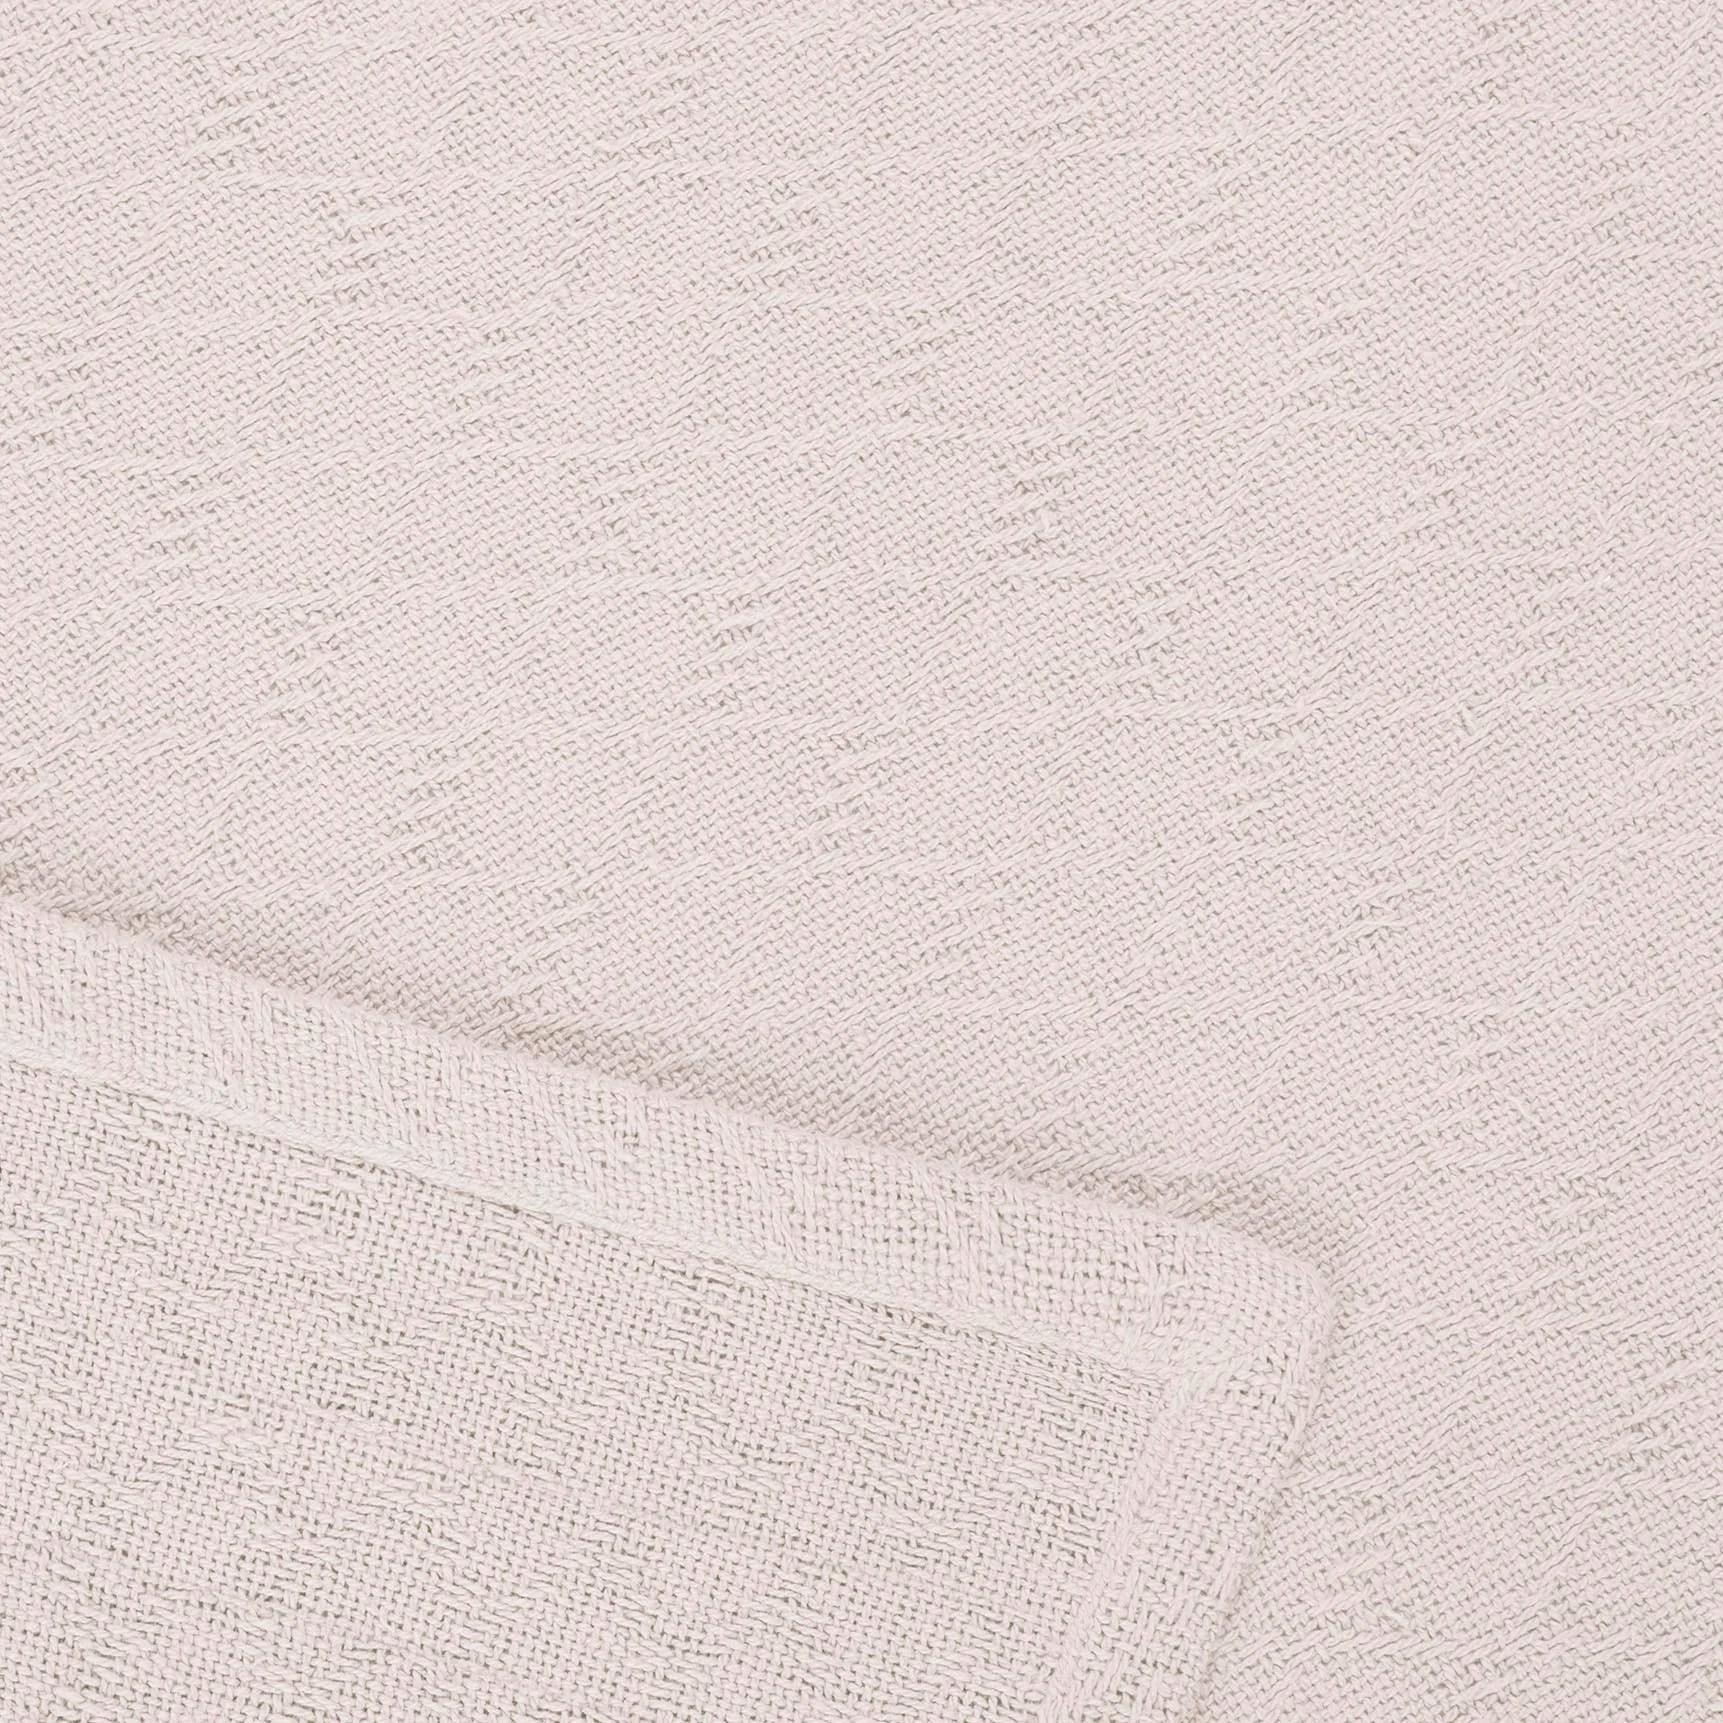 Beachcrest Home Melrose Park Cotton Throw Blanket Amp Reviews